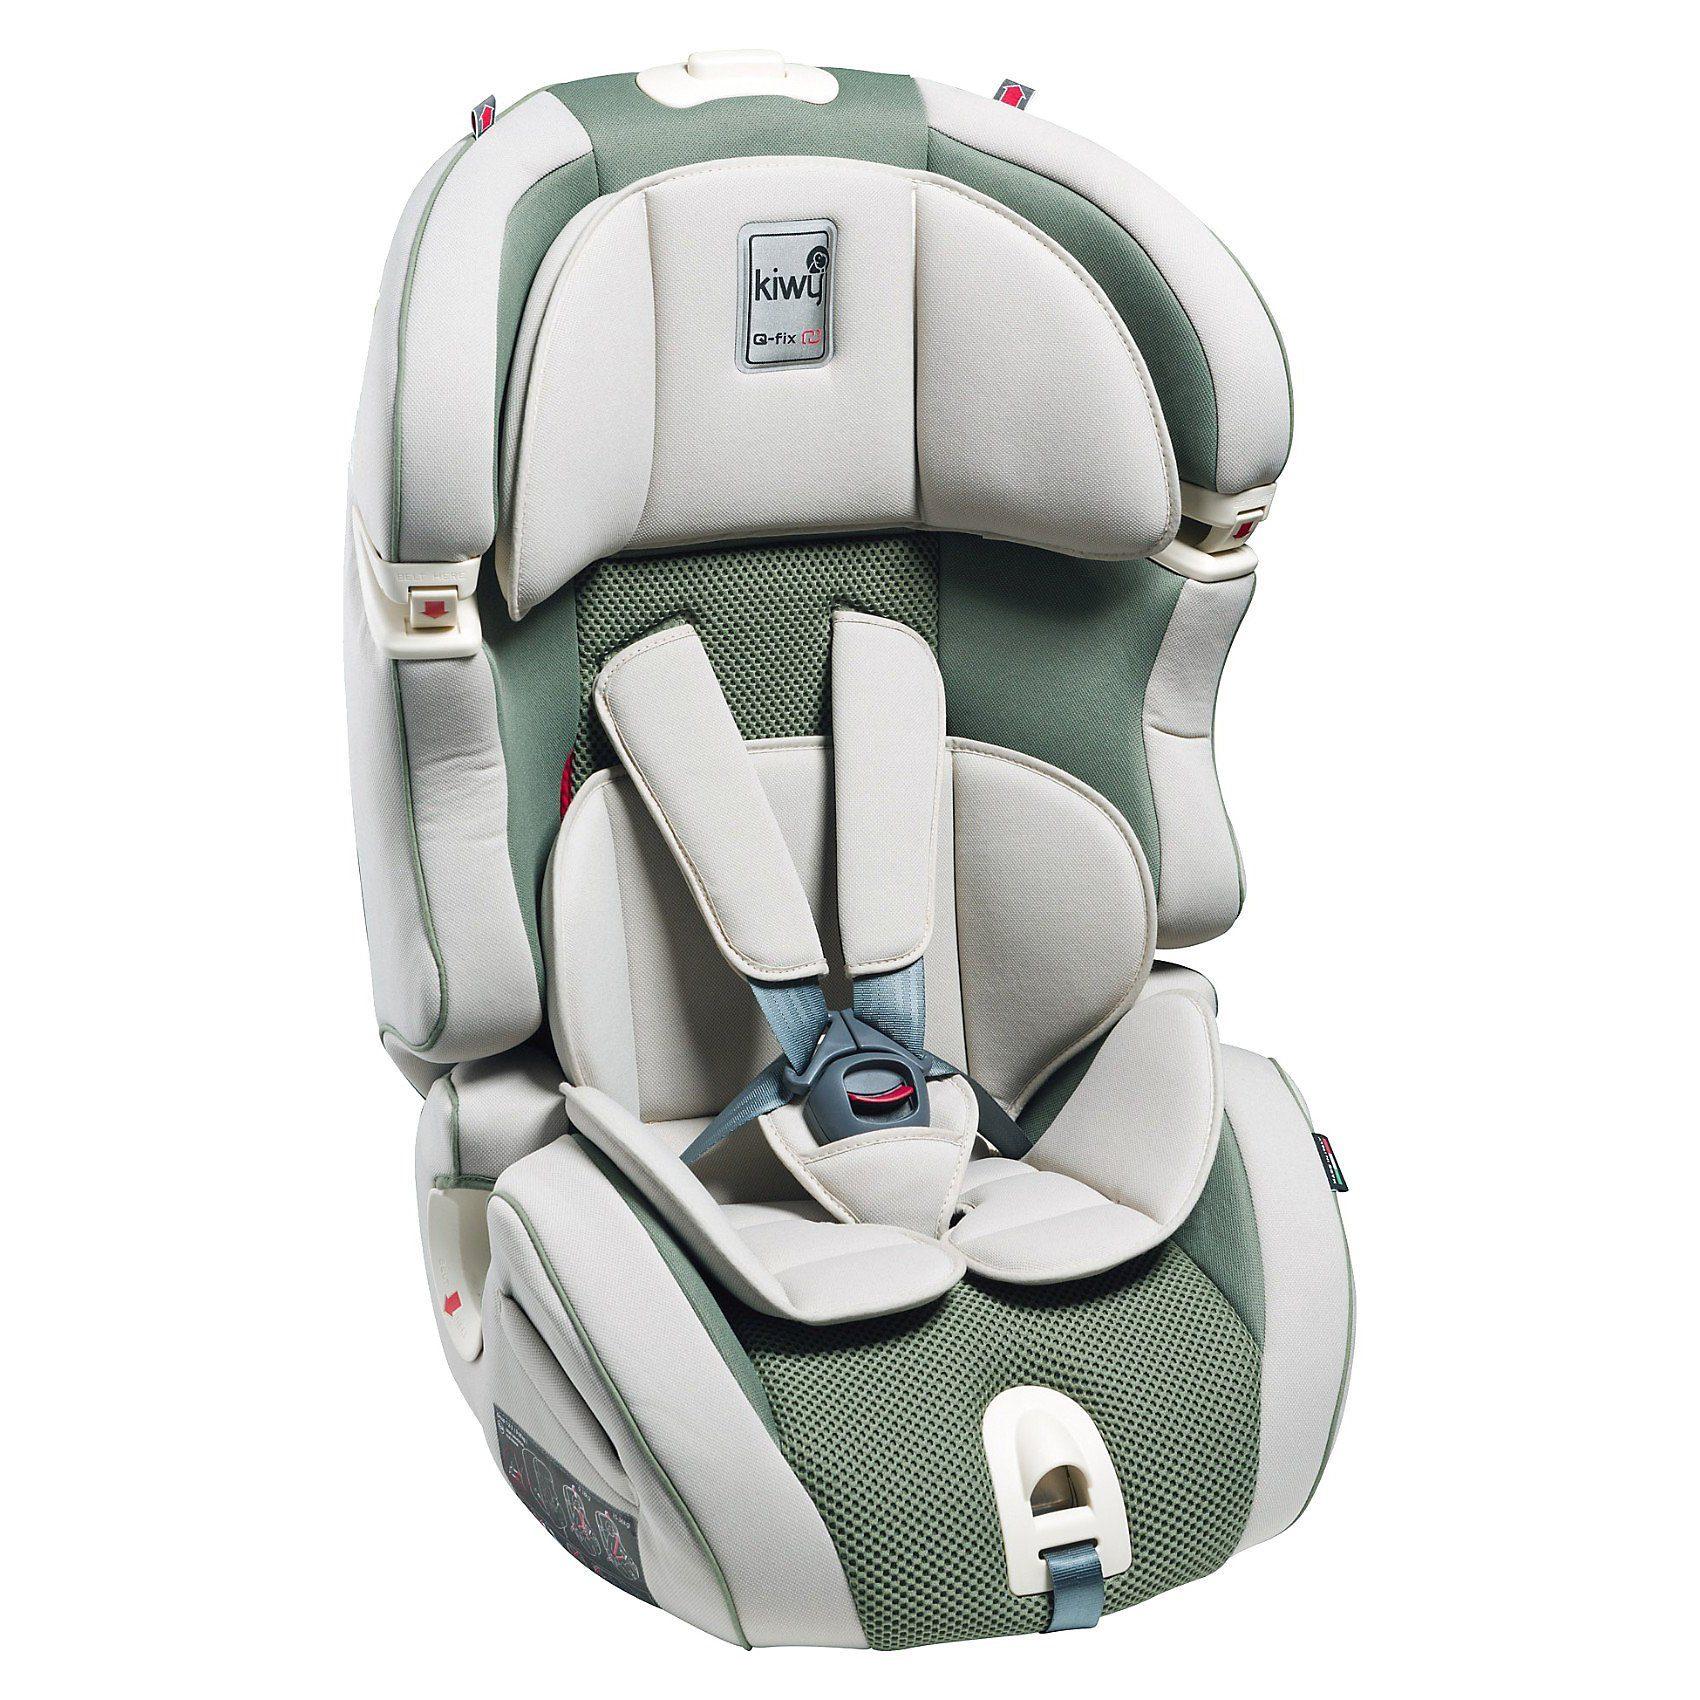 Kiwy Auto-Kindersitz SLF123 Q-Fix, Aloe, 2016